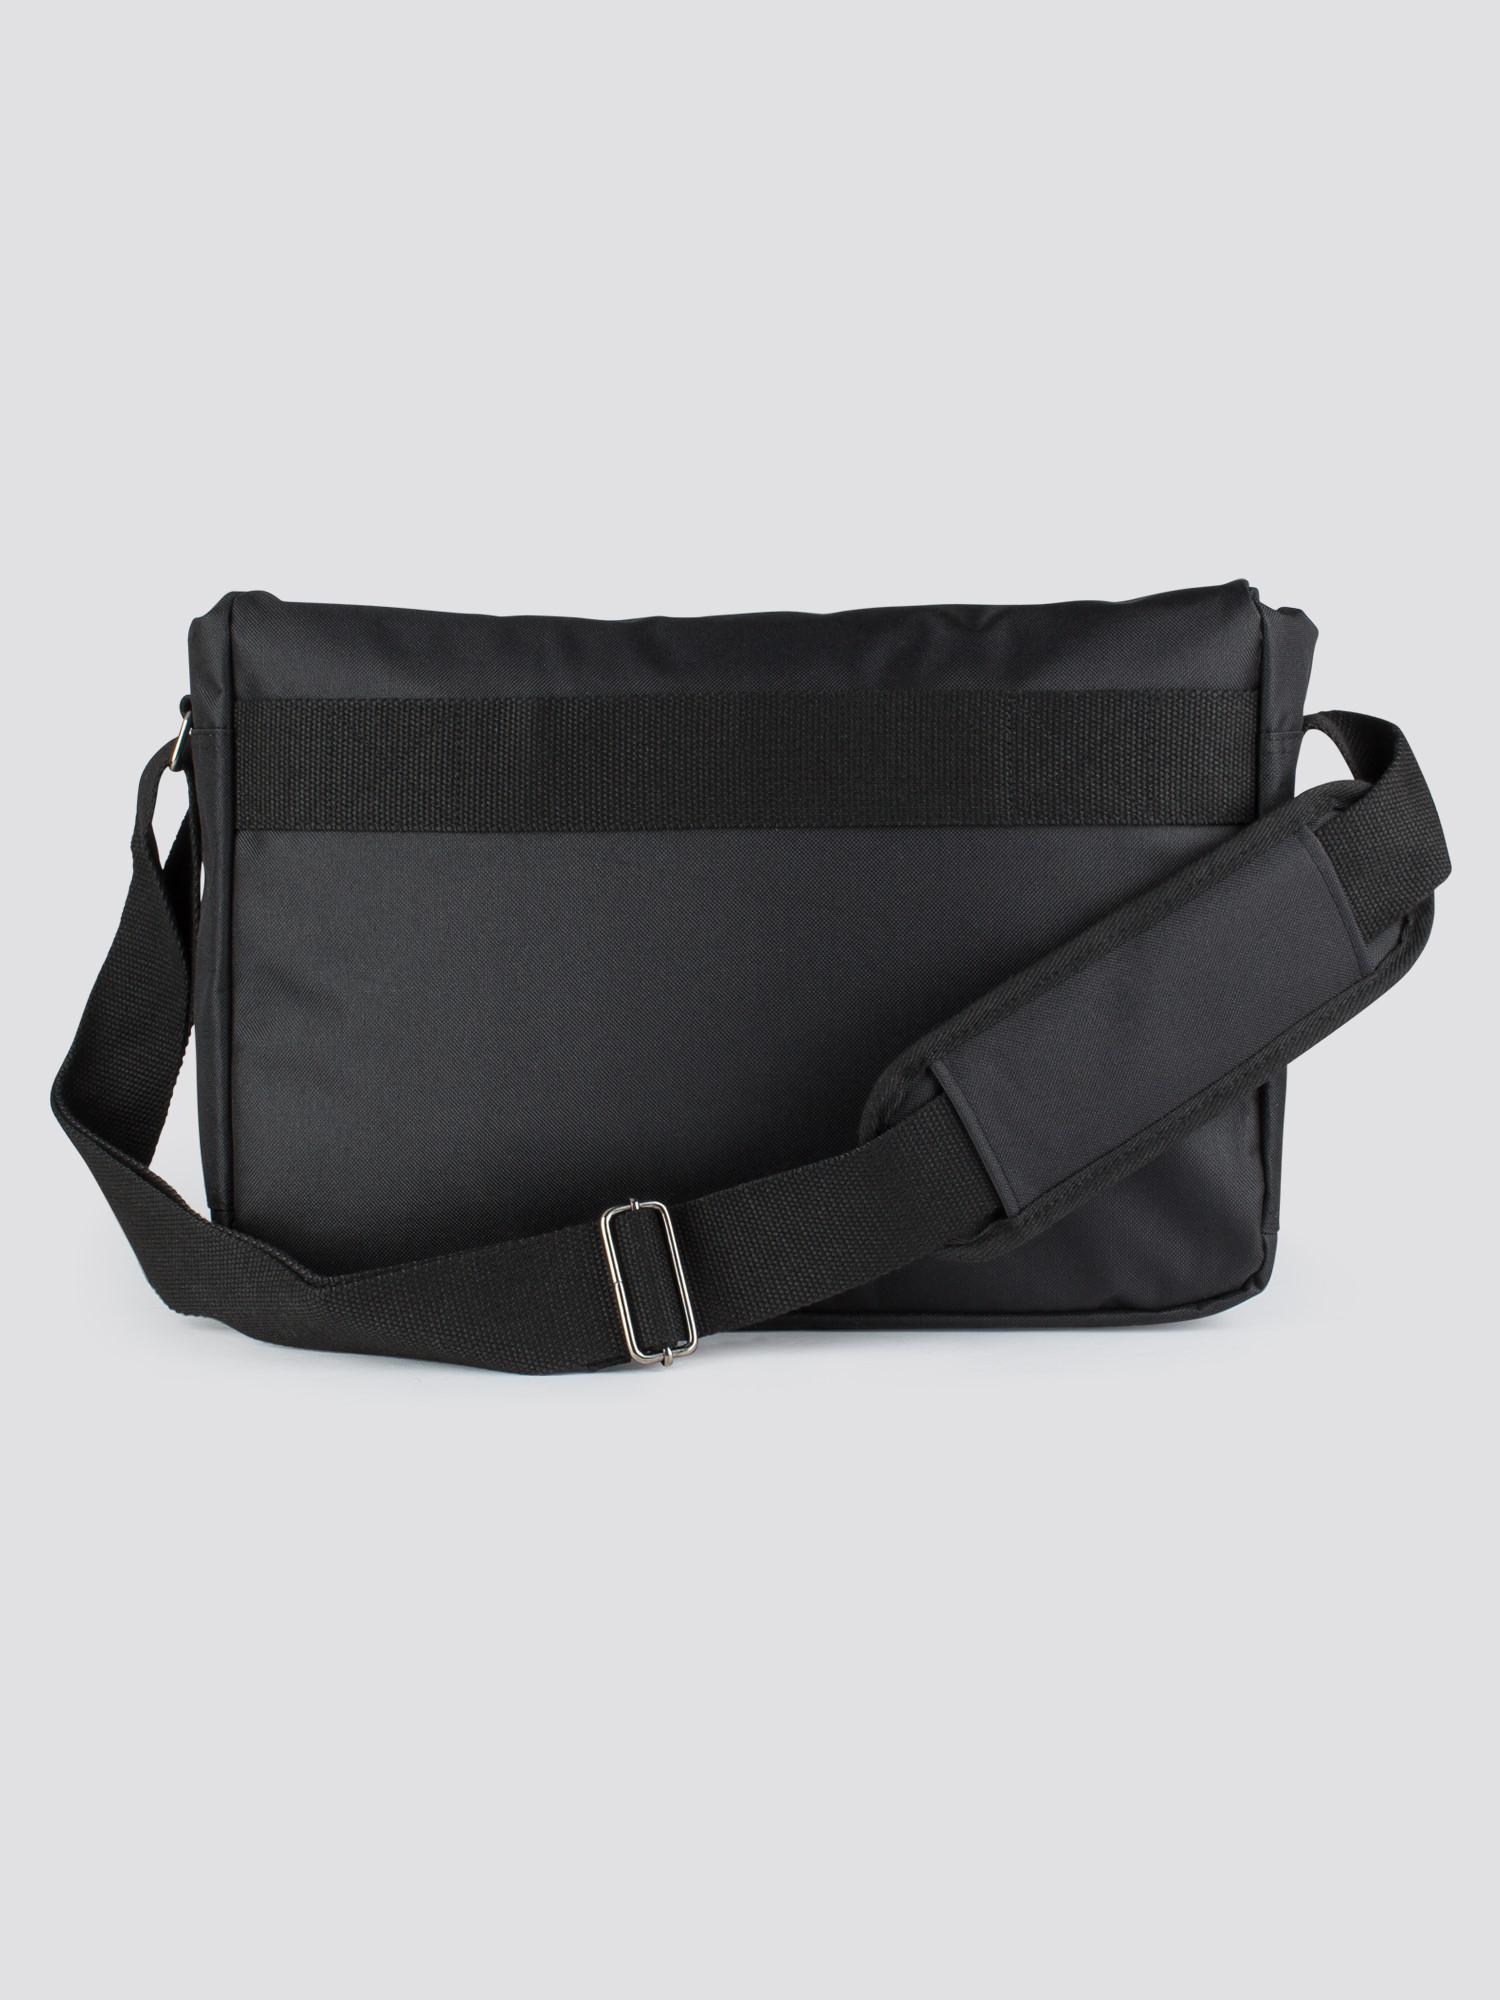 Ben Sherman City Range Stringer Messenger Bag in Black for Men - Lyst c3ca8ec3e943a